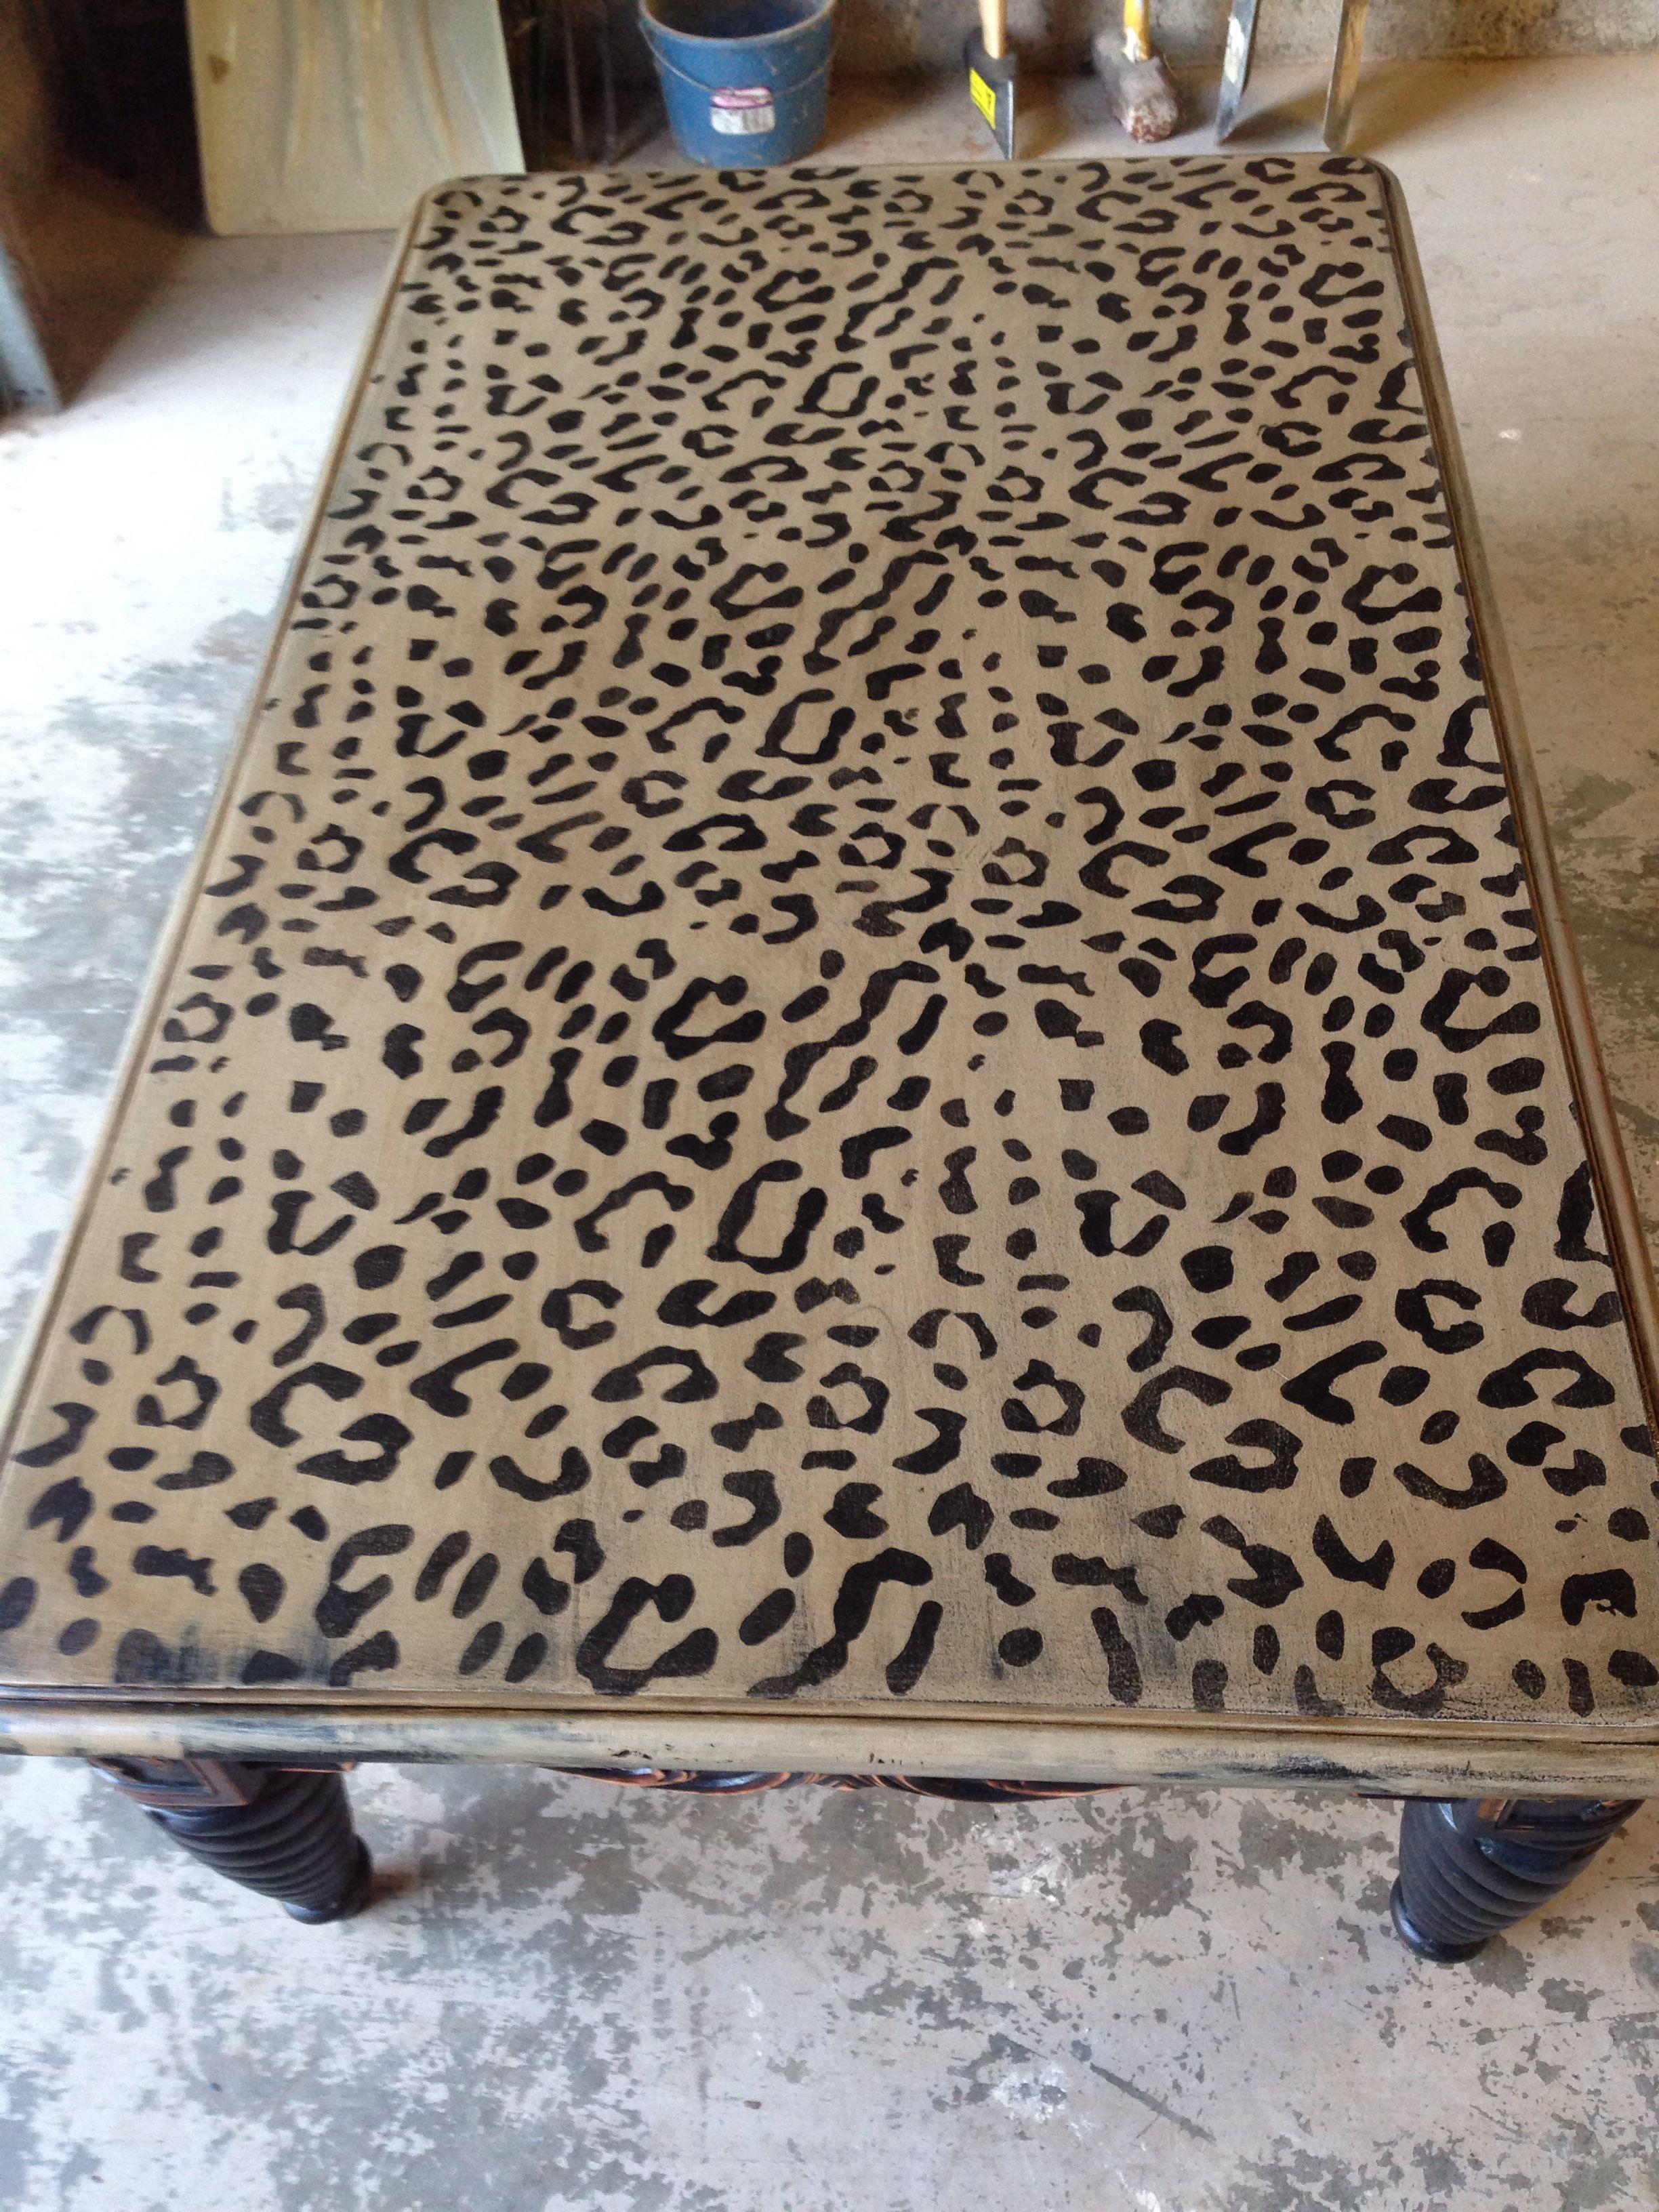 Leopard Print Coffee Table Animal Print Furniture Leopard